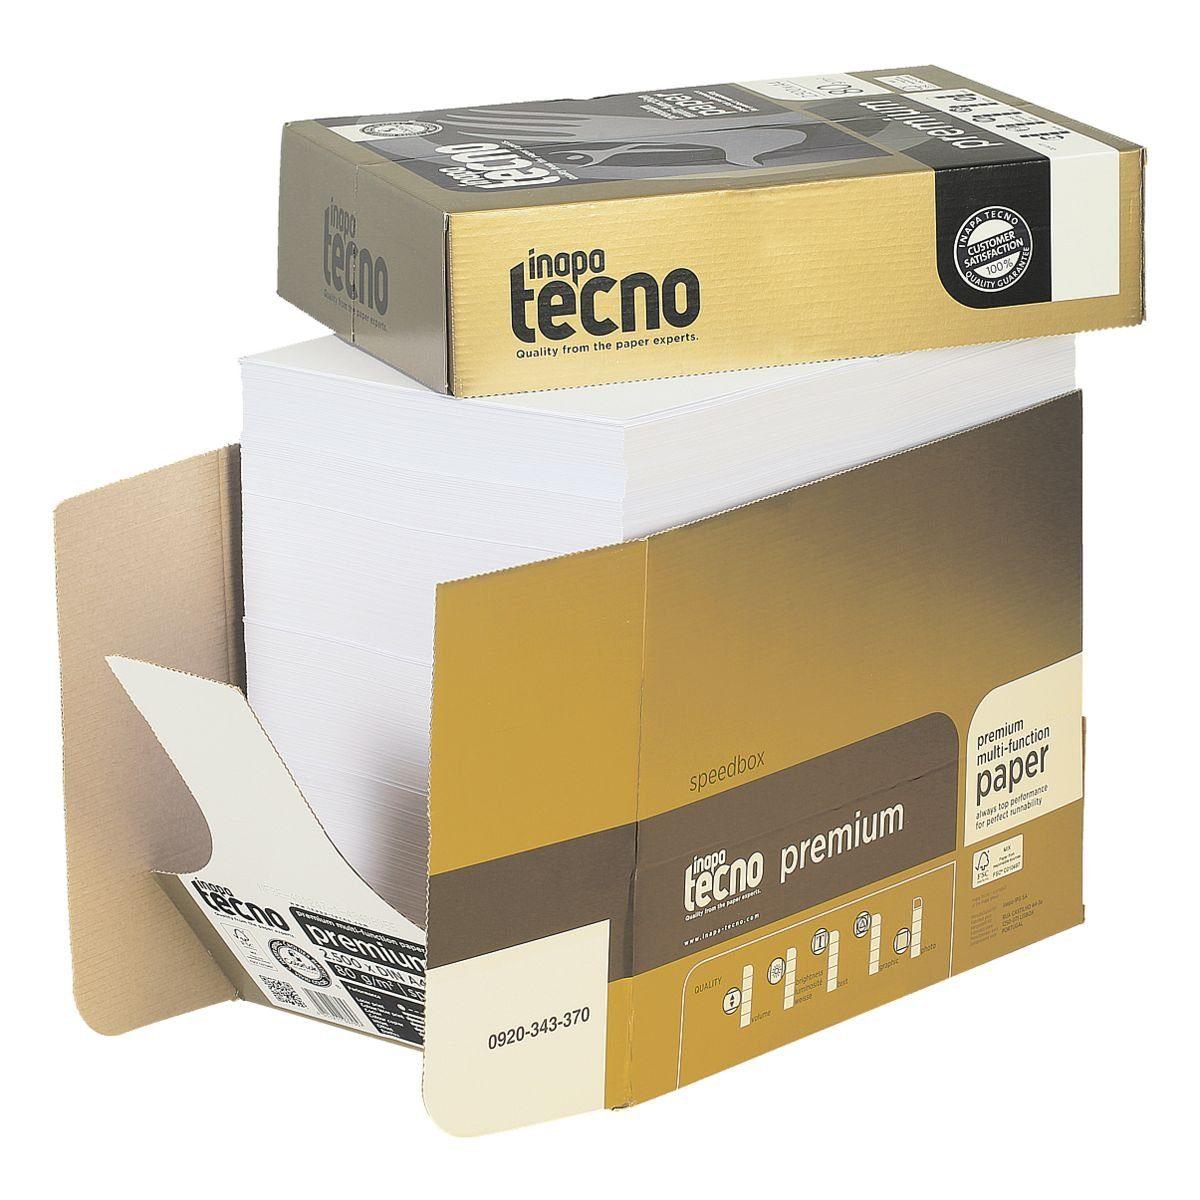 Inapa tecno Öko-Box Multifunktionales Druckerpapier »Premium«